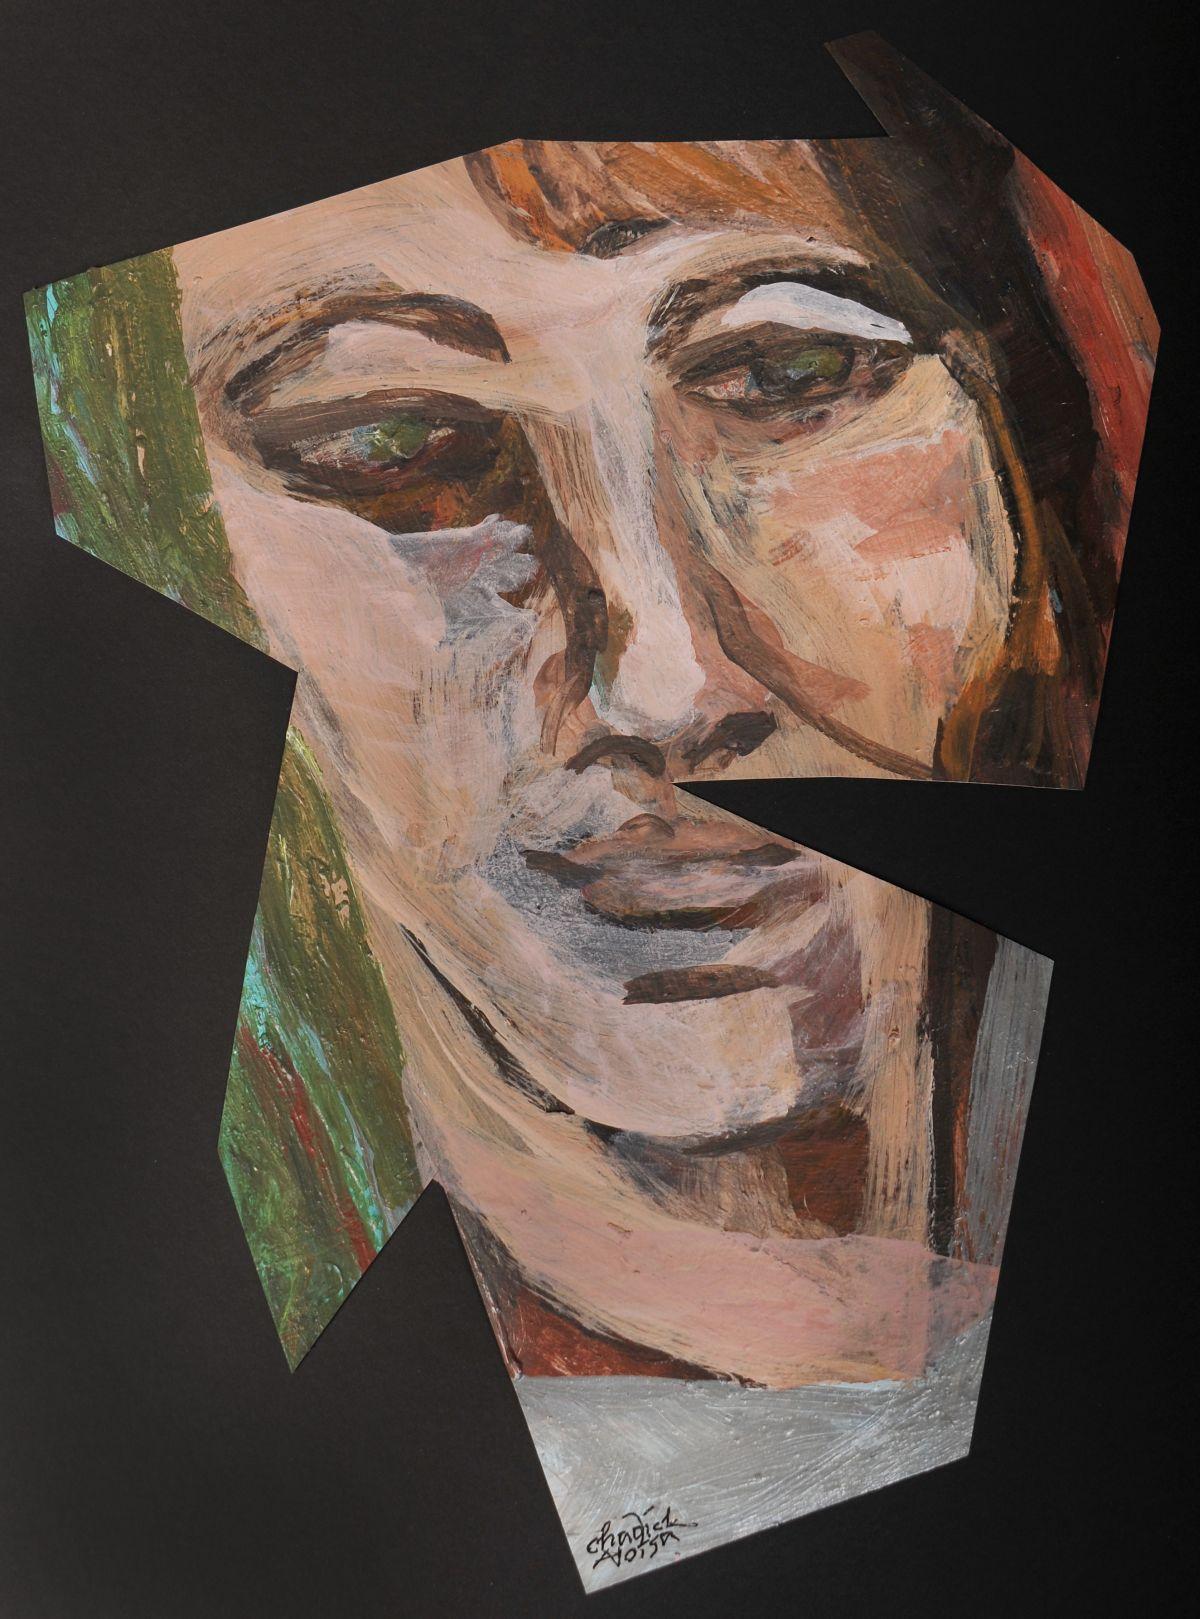 Pam Chadick Aloisa. Stripped Face